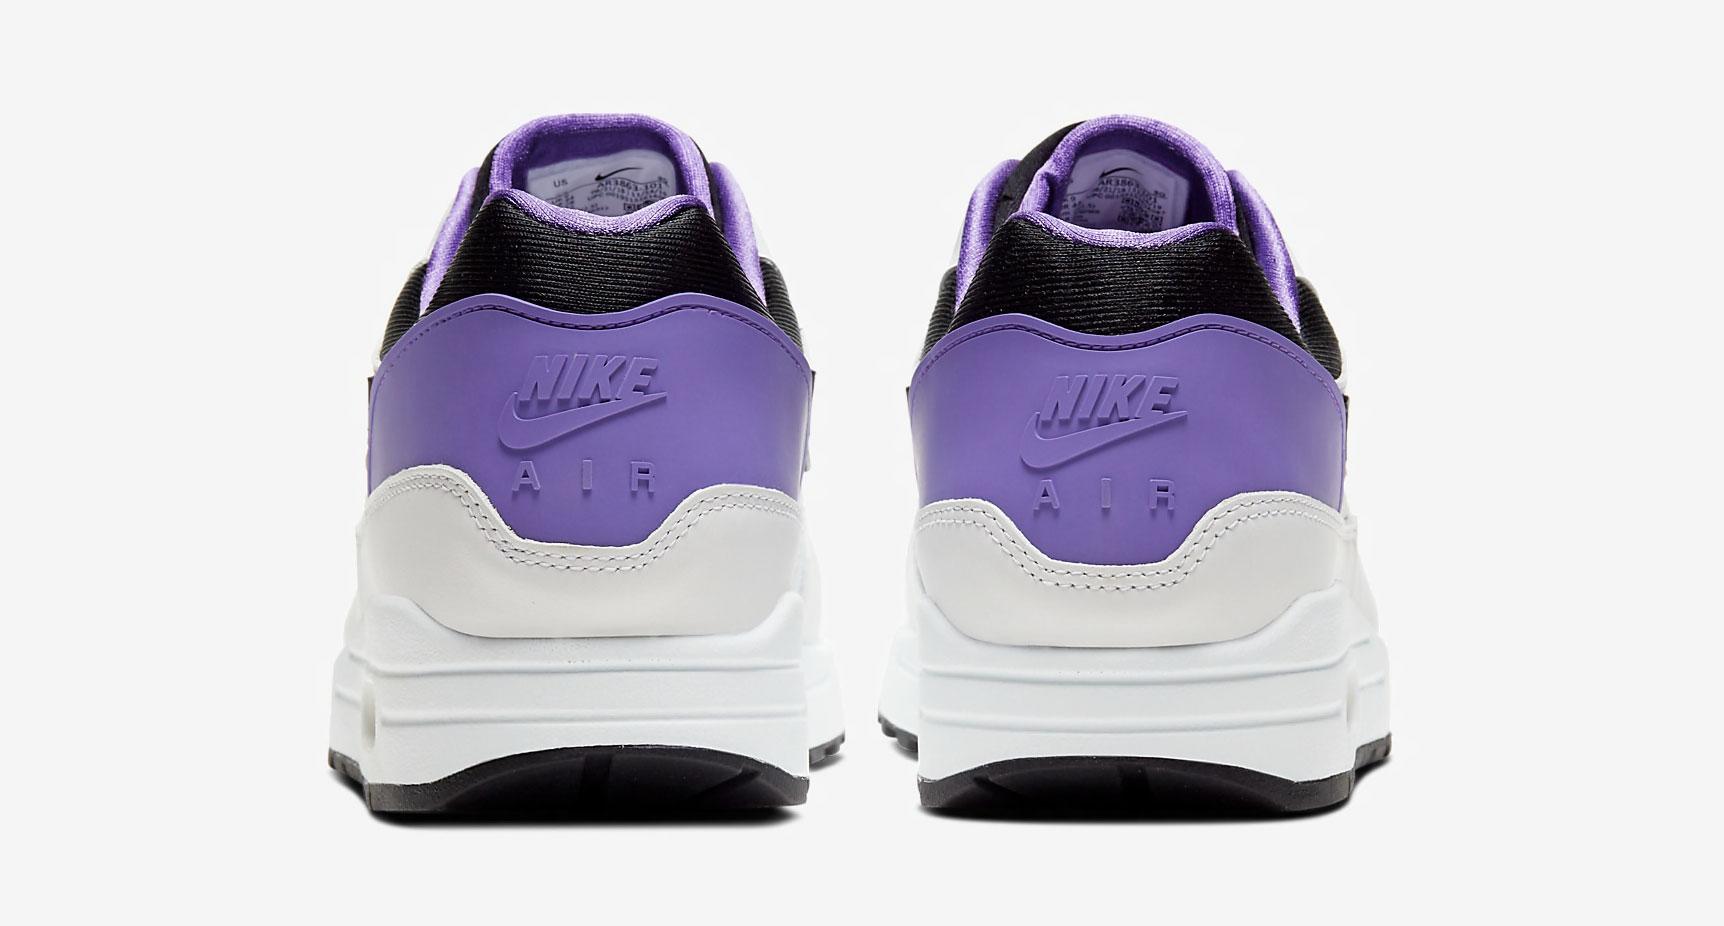 nike-air-max-1-dna-chapter-1-huarache-purple-punch-1